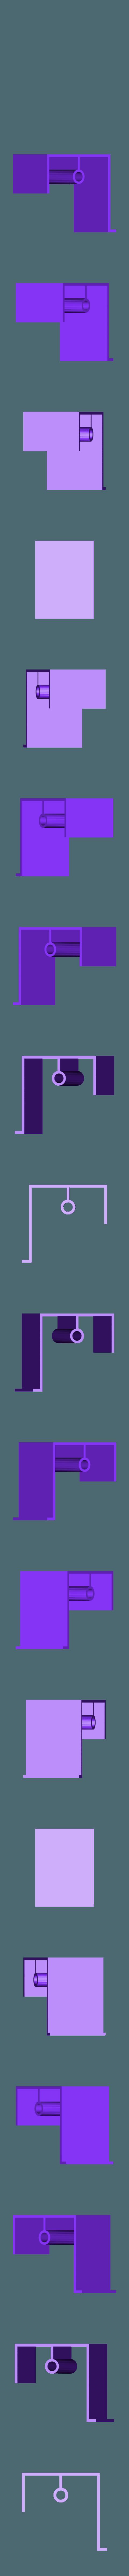 Seat.stl Download free STL file Ferris Wheel • 3D printing template, gzumwalt